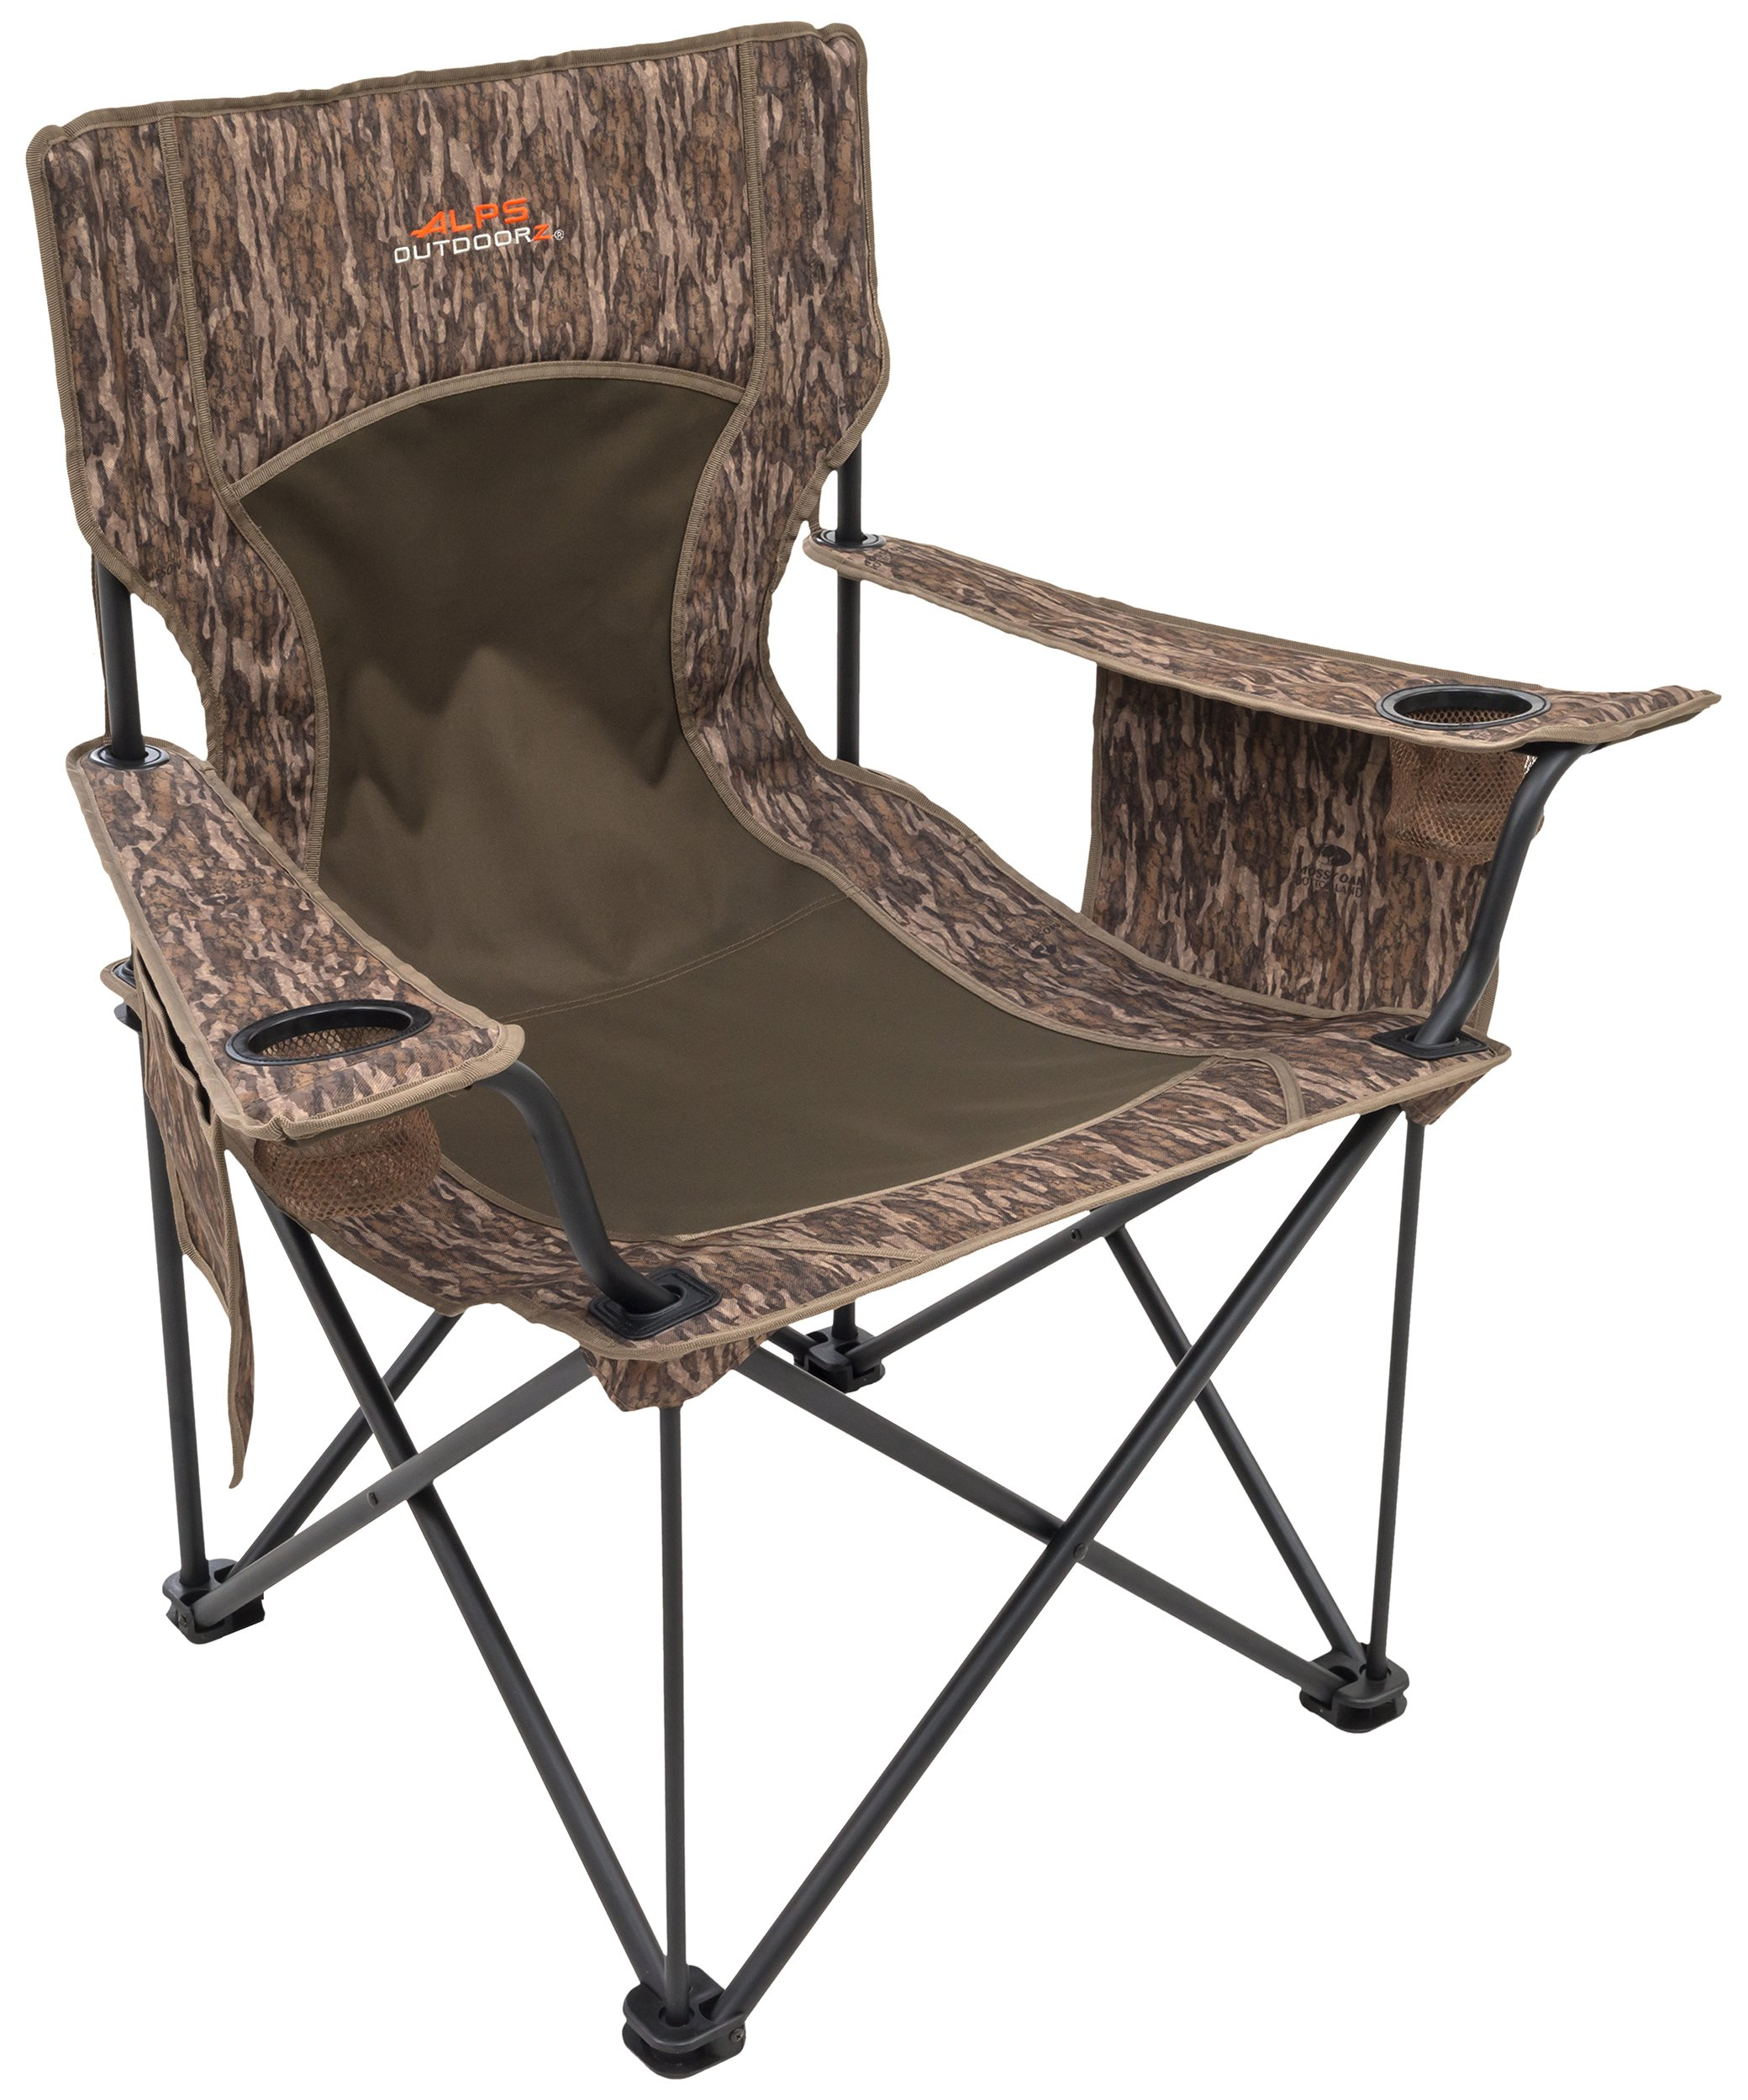 ALPS OutdoorZ King Kong Chair, Mossy Oak Bottomland